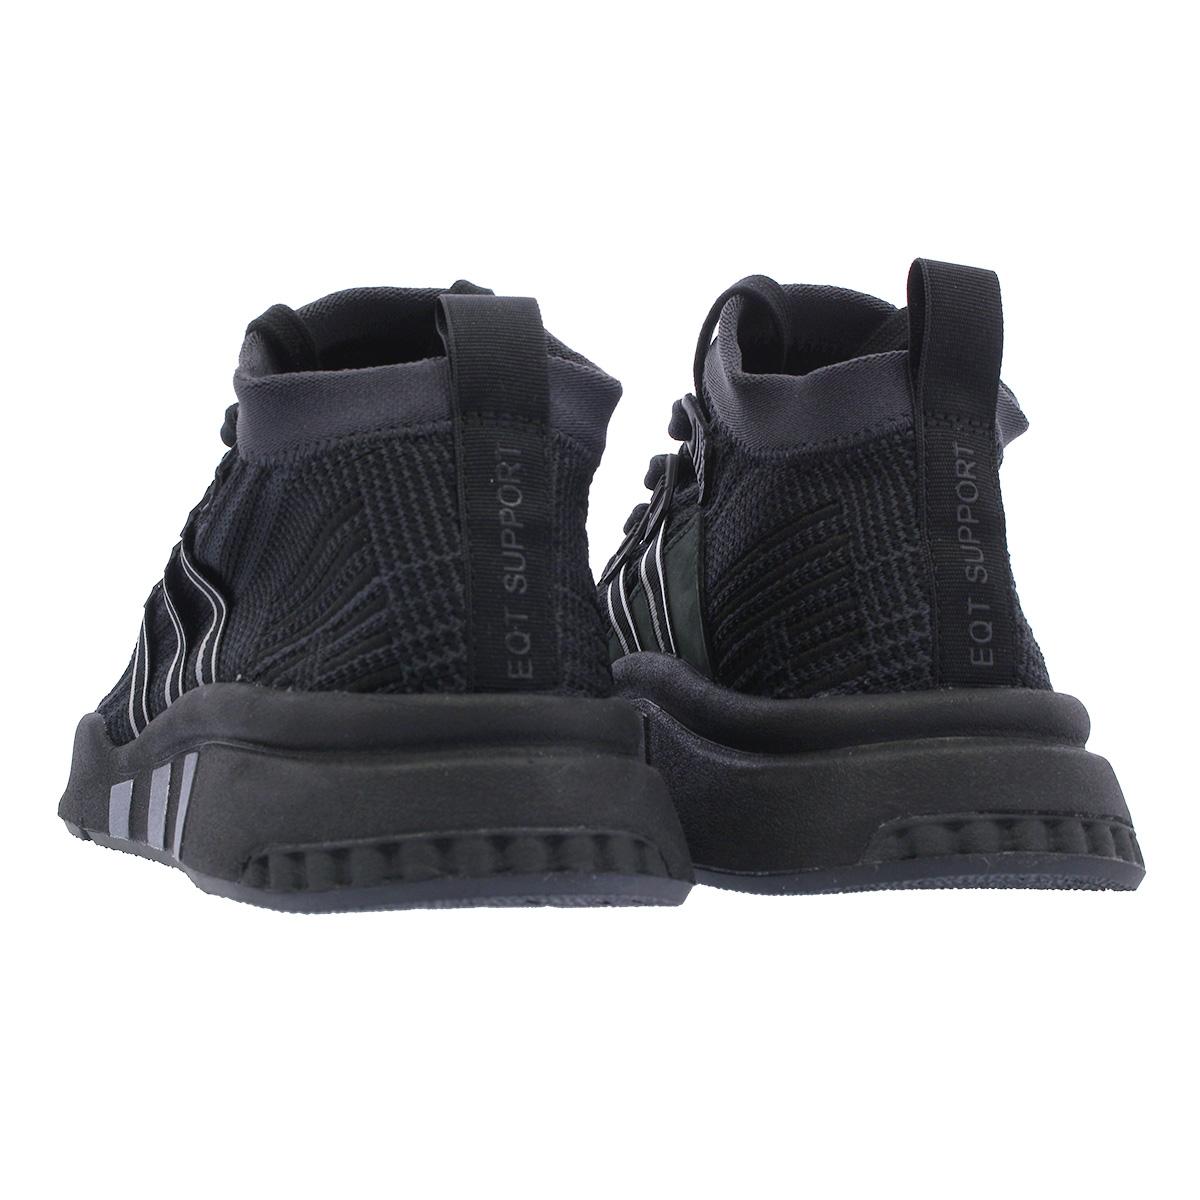 buy online 6c907 9d802 adidas EQT SUPPORT MID ADV PK Adidas EQT support mid ADV PK CORE  BLACK/CARBON/SOLAR YELLOW b37456